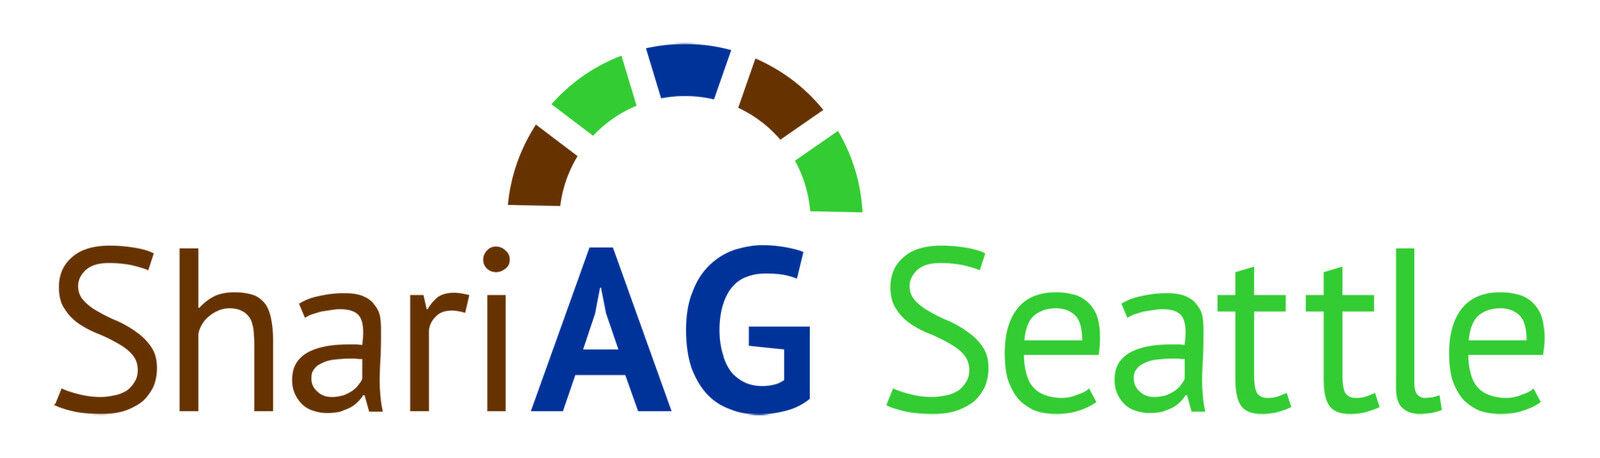 Shari AG Seattle